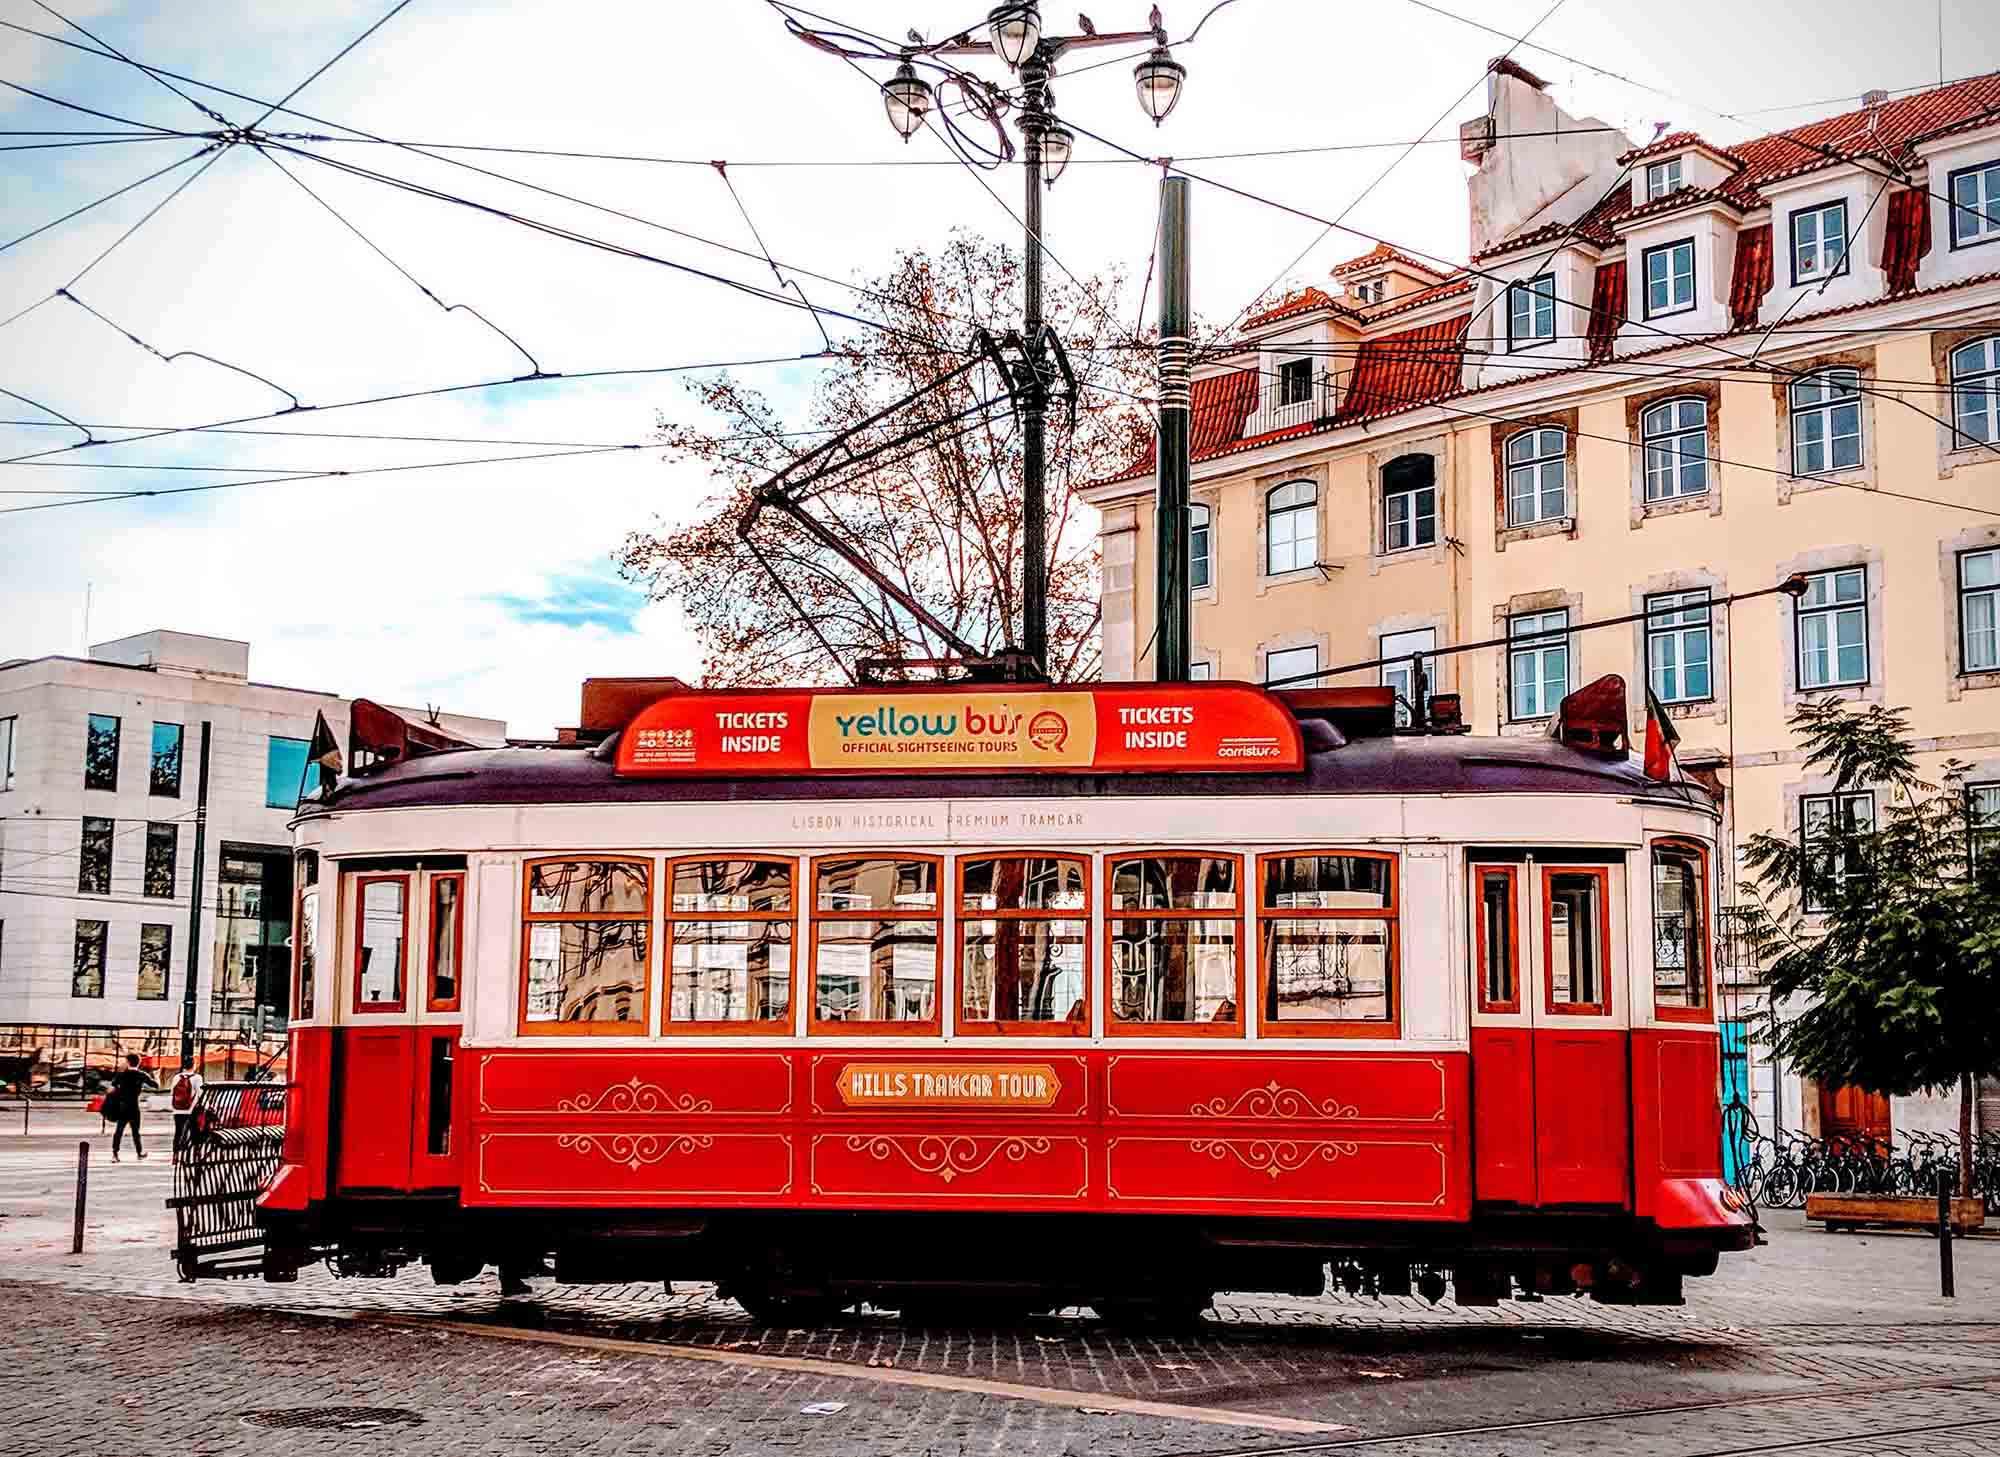 Lisbon sightseeing tram